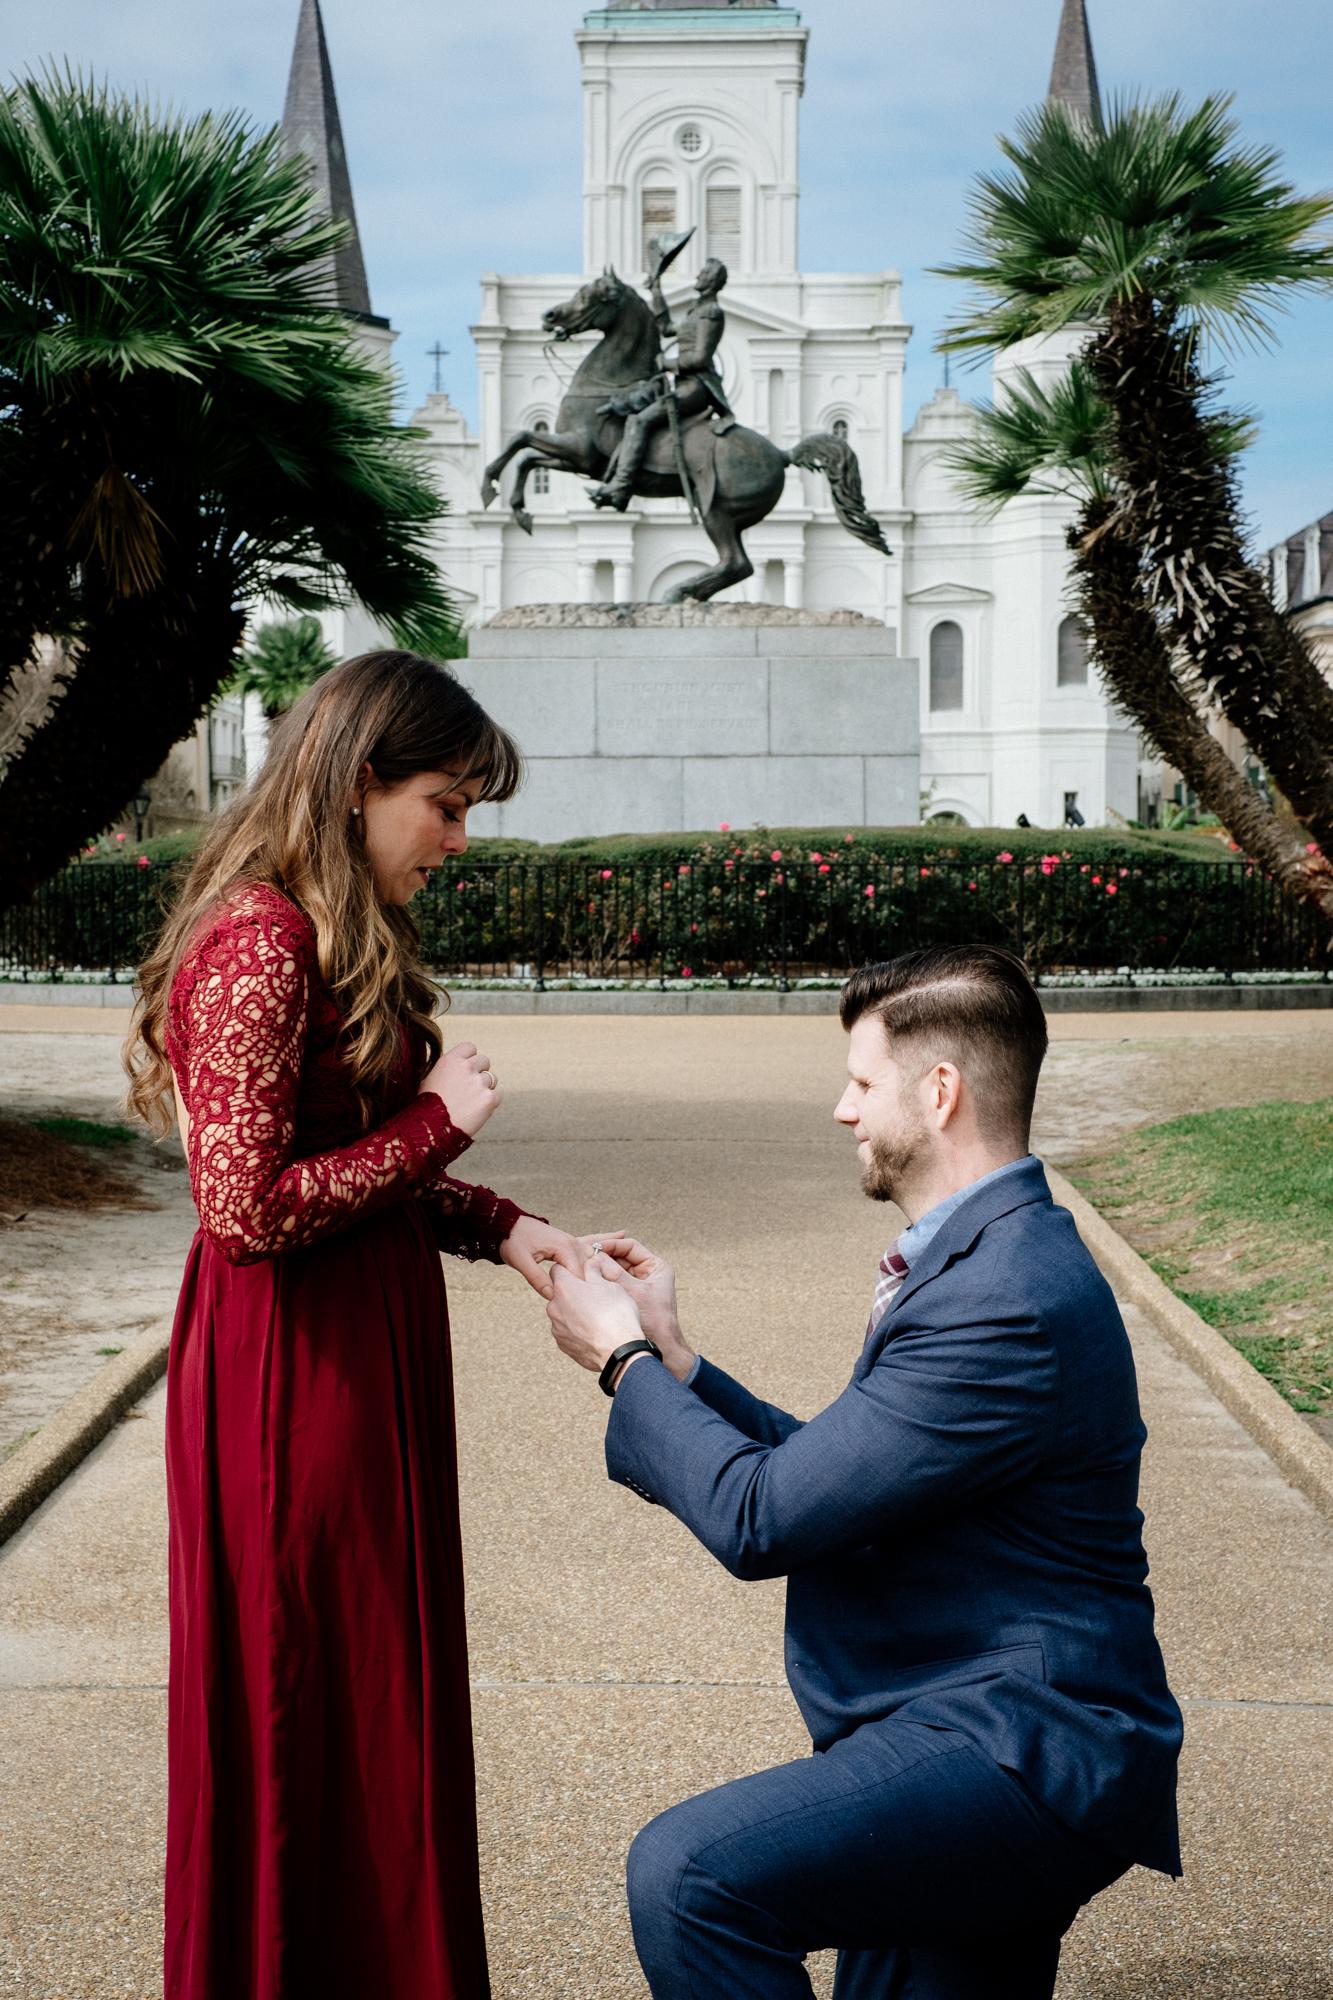 Jen_Montgomery_Photography_Angela_Brian_Engagement_Proposal_FB-15.jpg